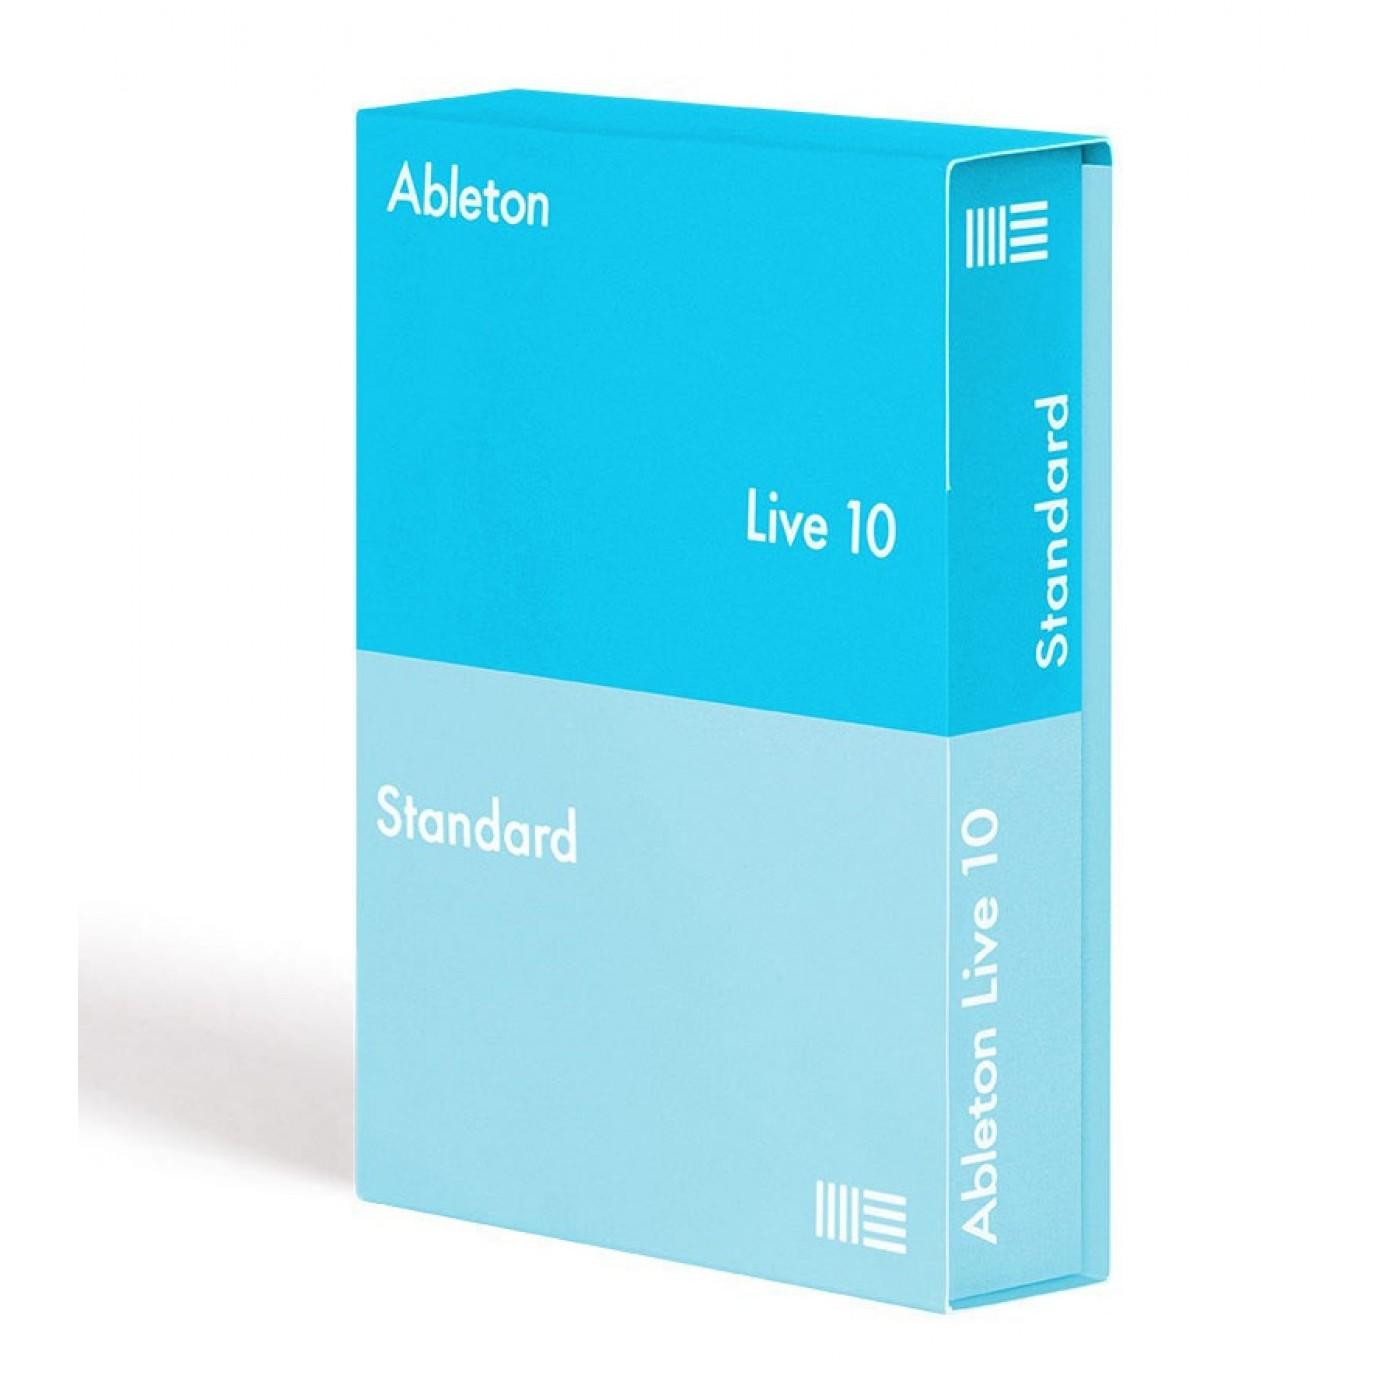 Ableton LIVE 10 Actualizacion desde Live Lite | Rage Audio